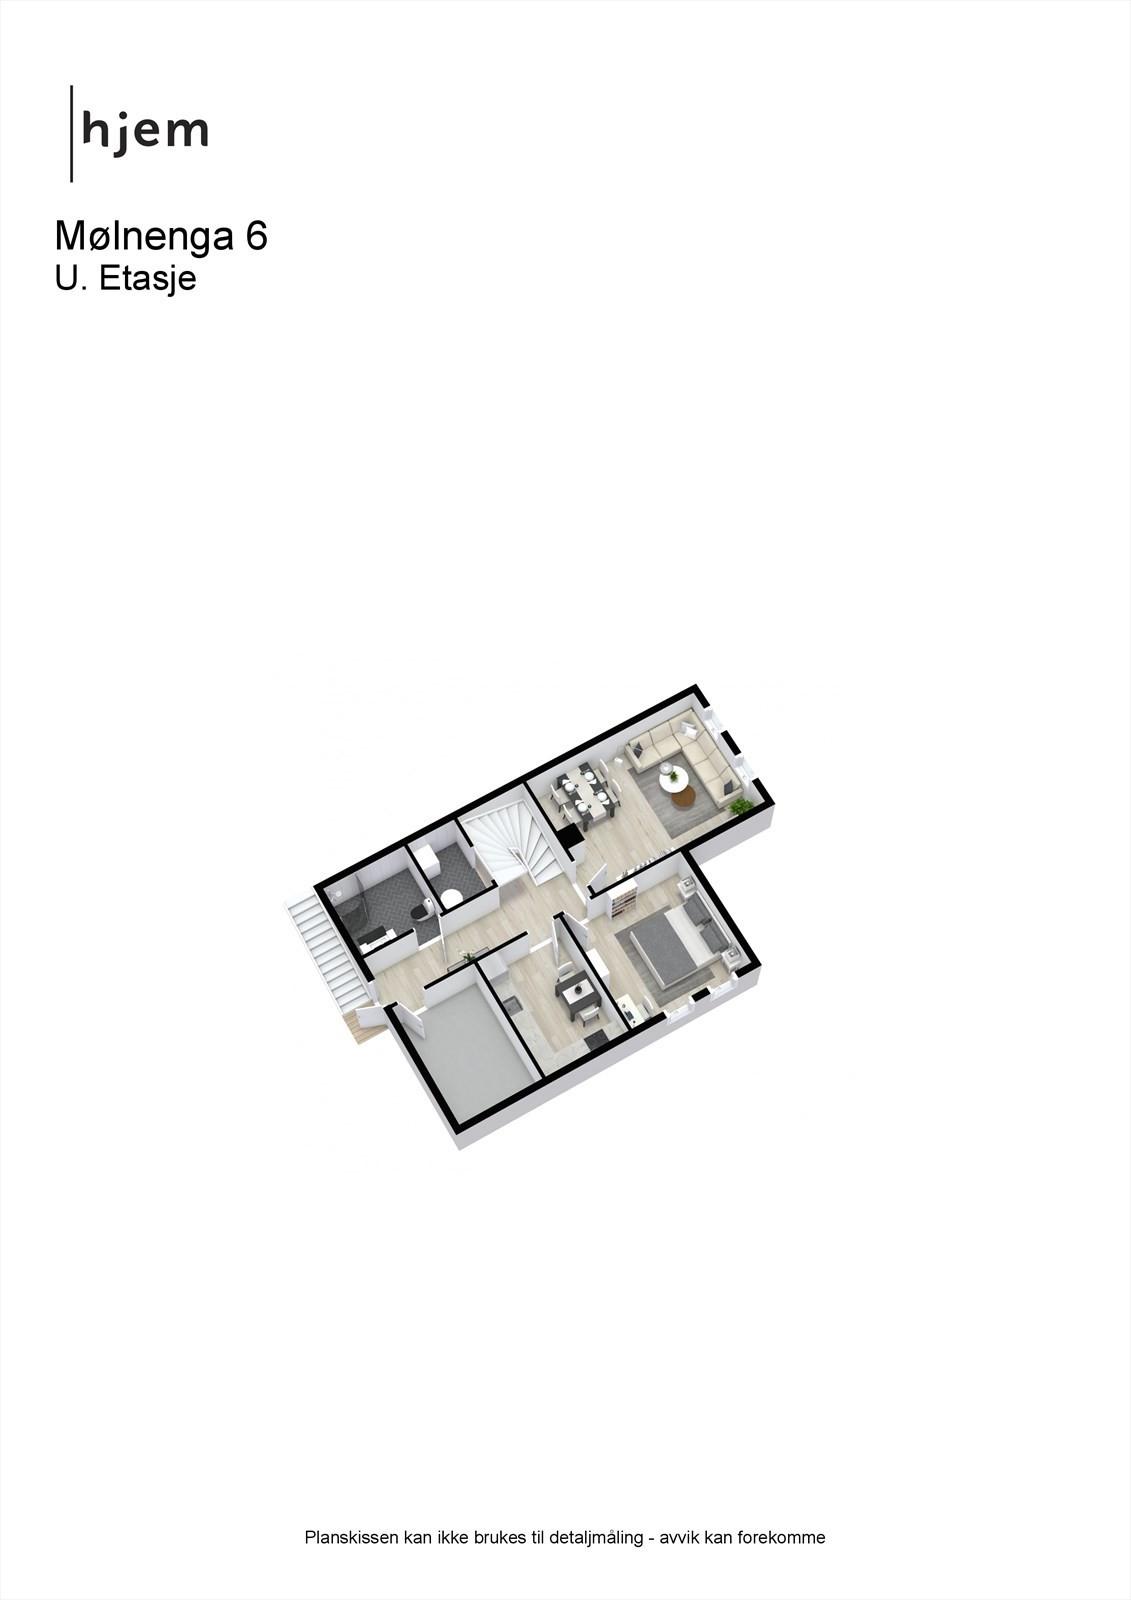 Mølnenga 6 - 3D - U. Etasje - Letterhead.jpg